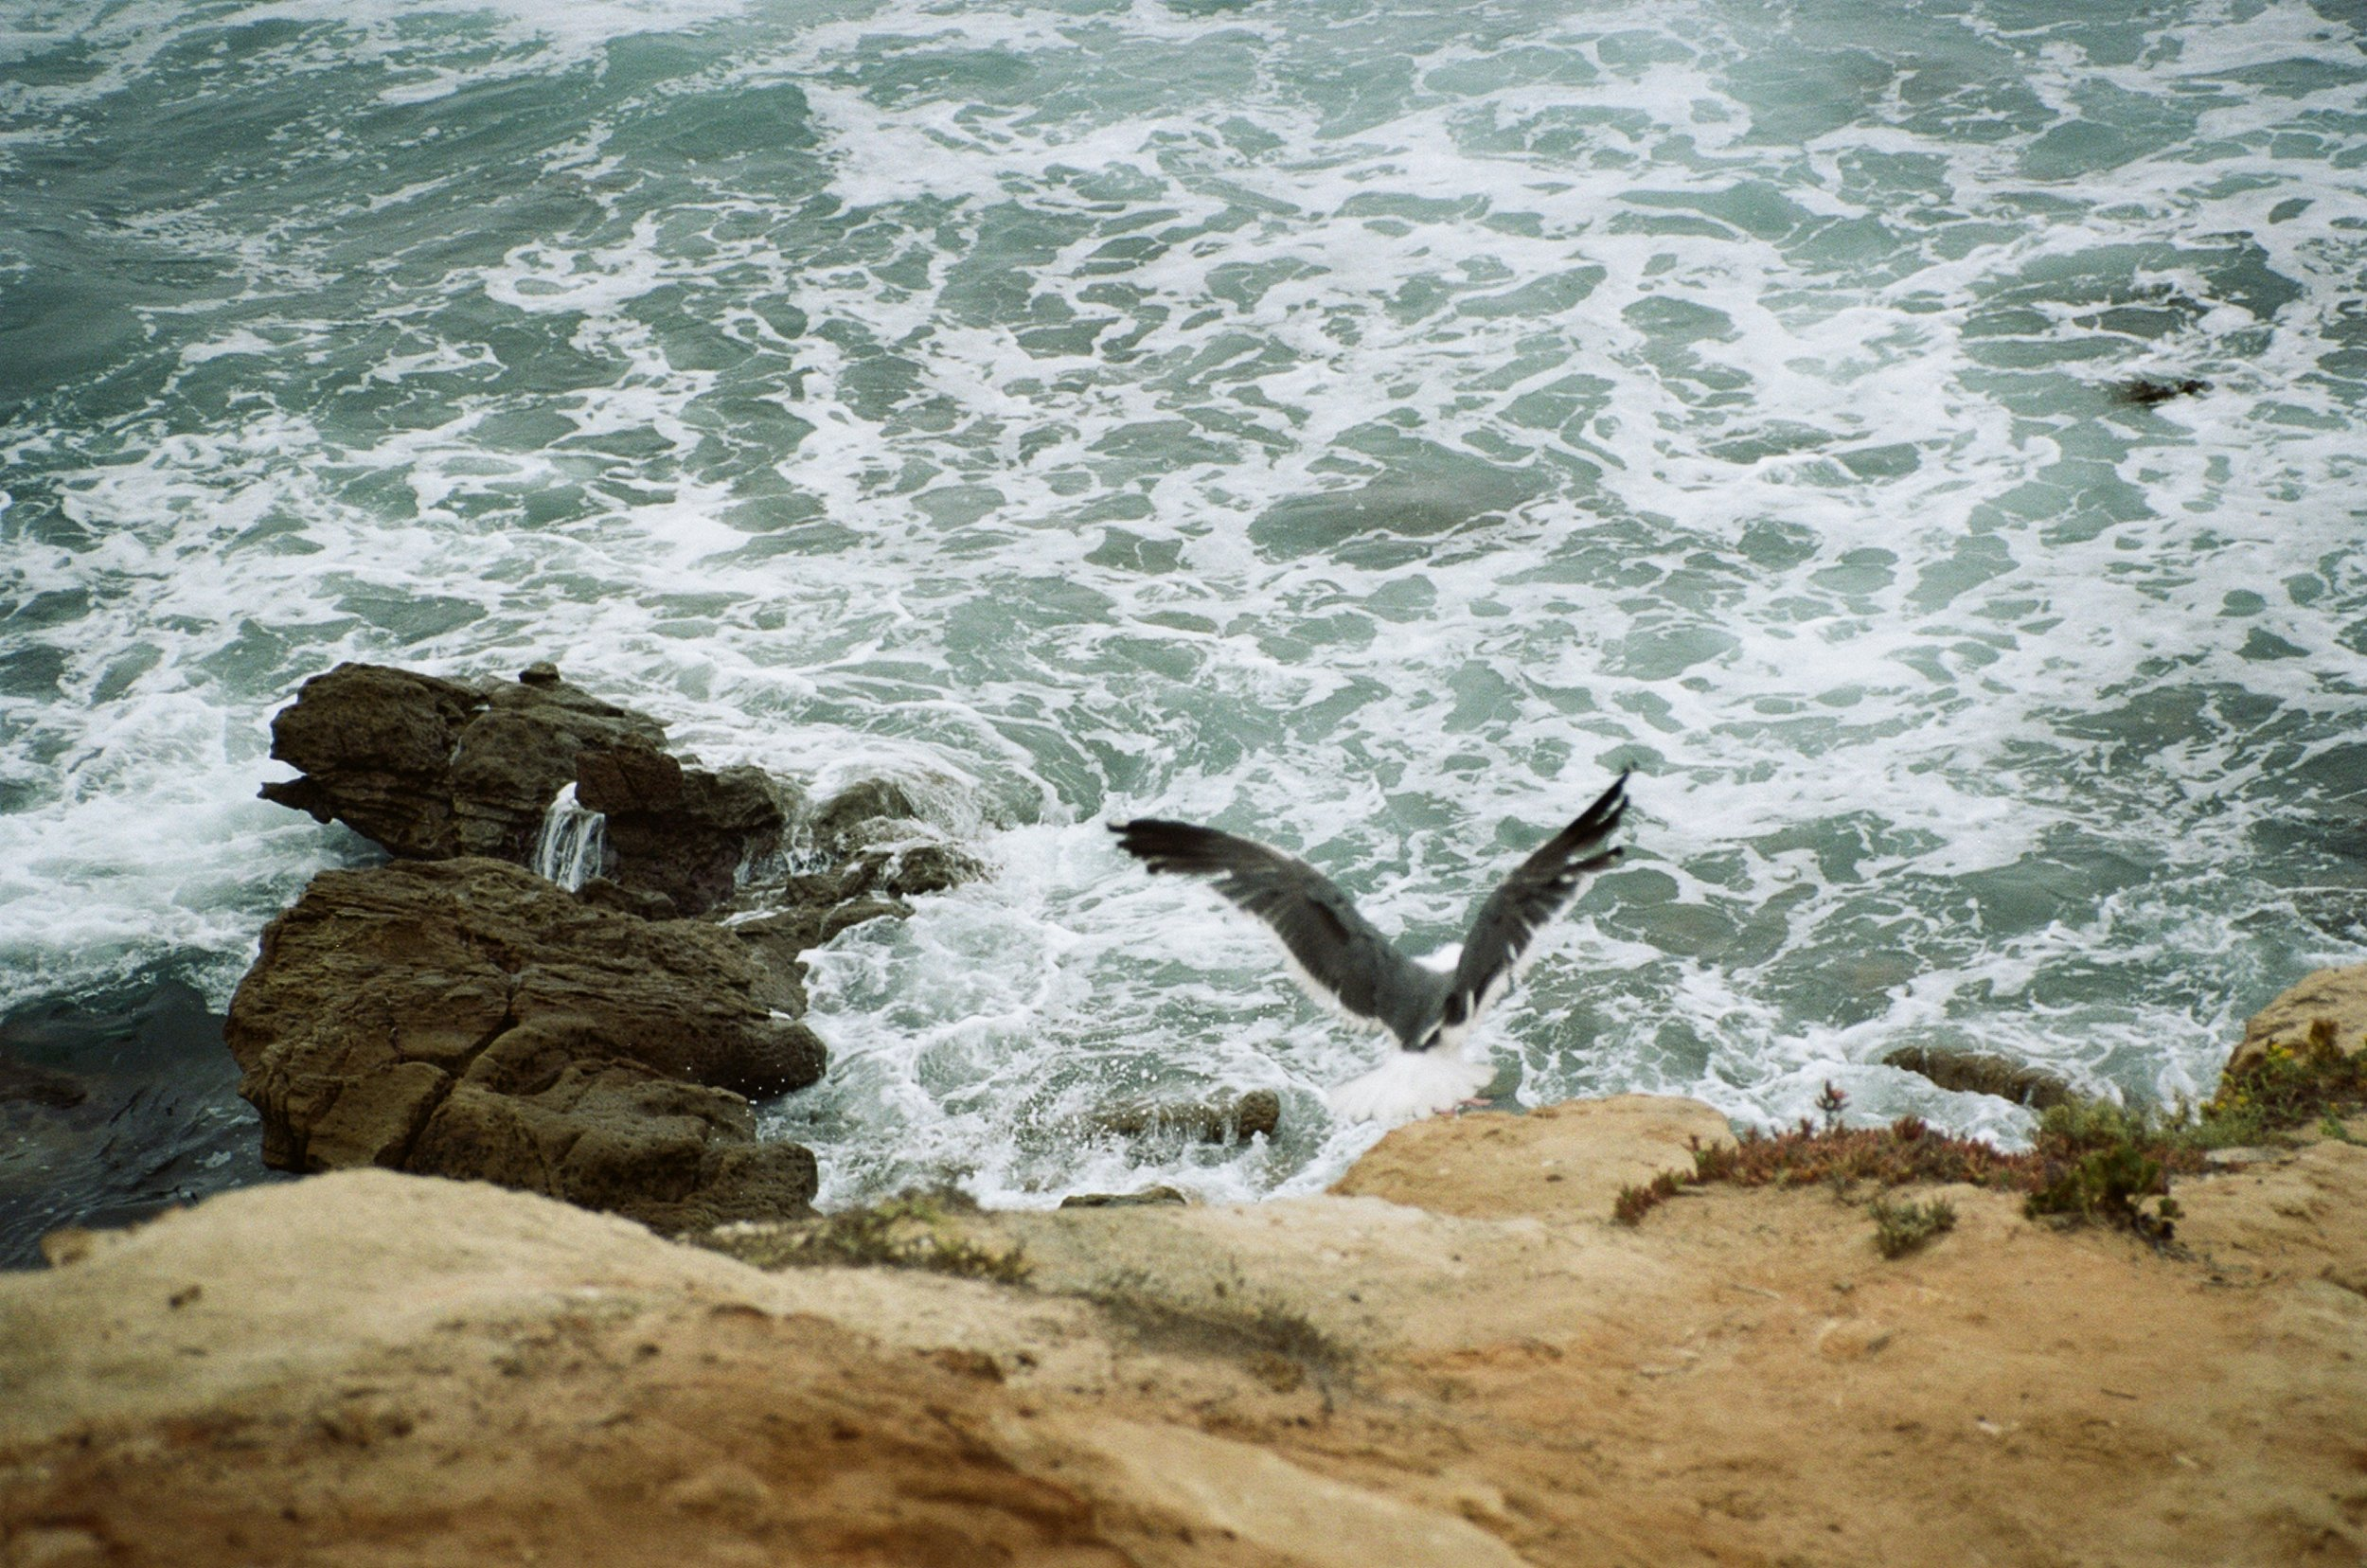 Flight, Laguna Beach, CA, USA